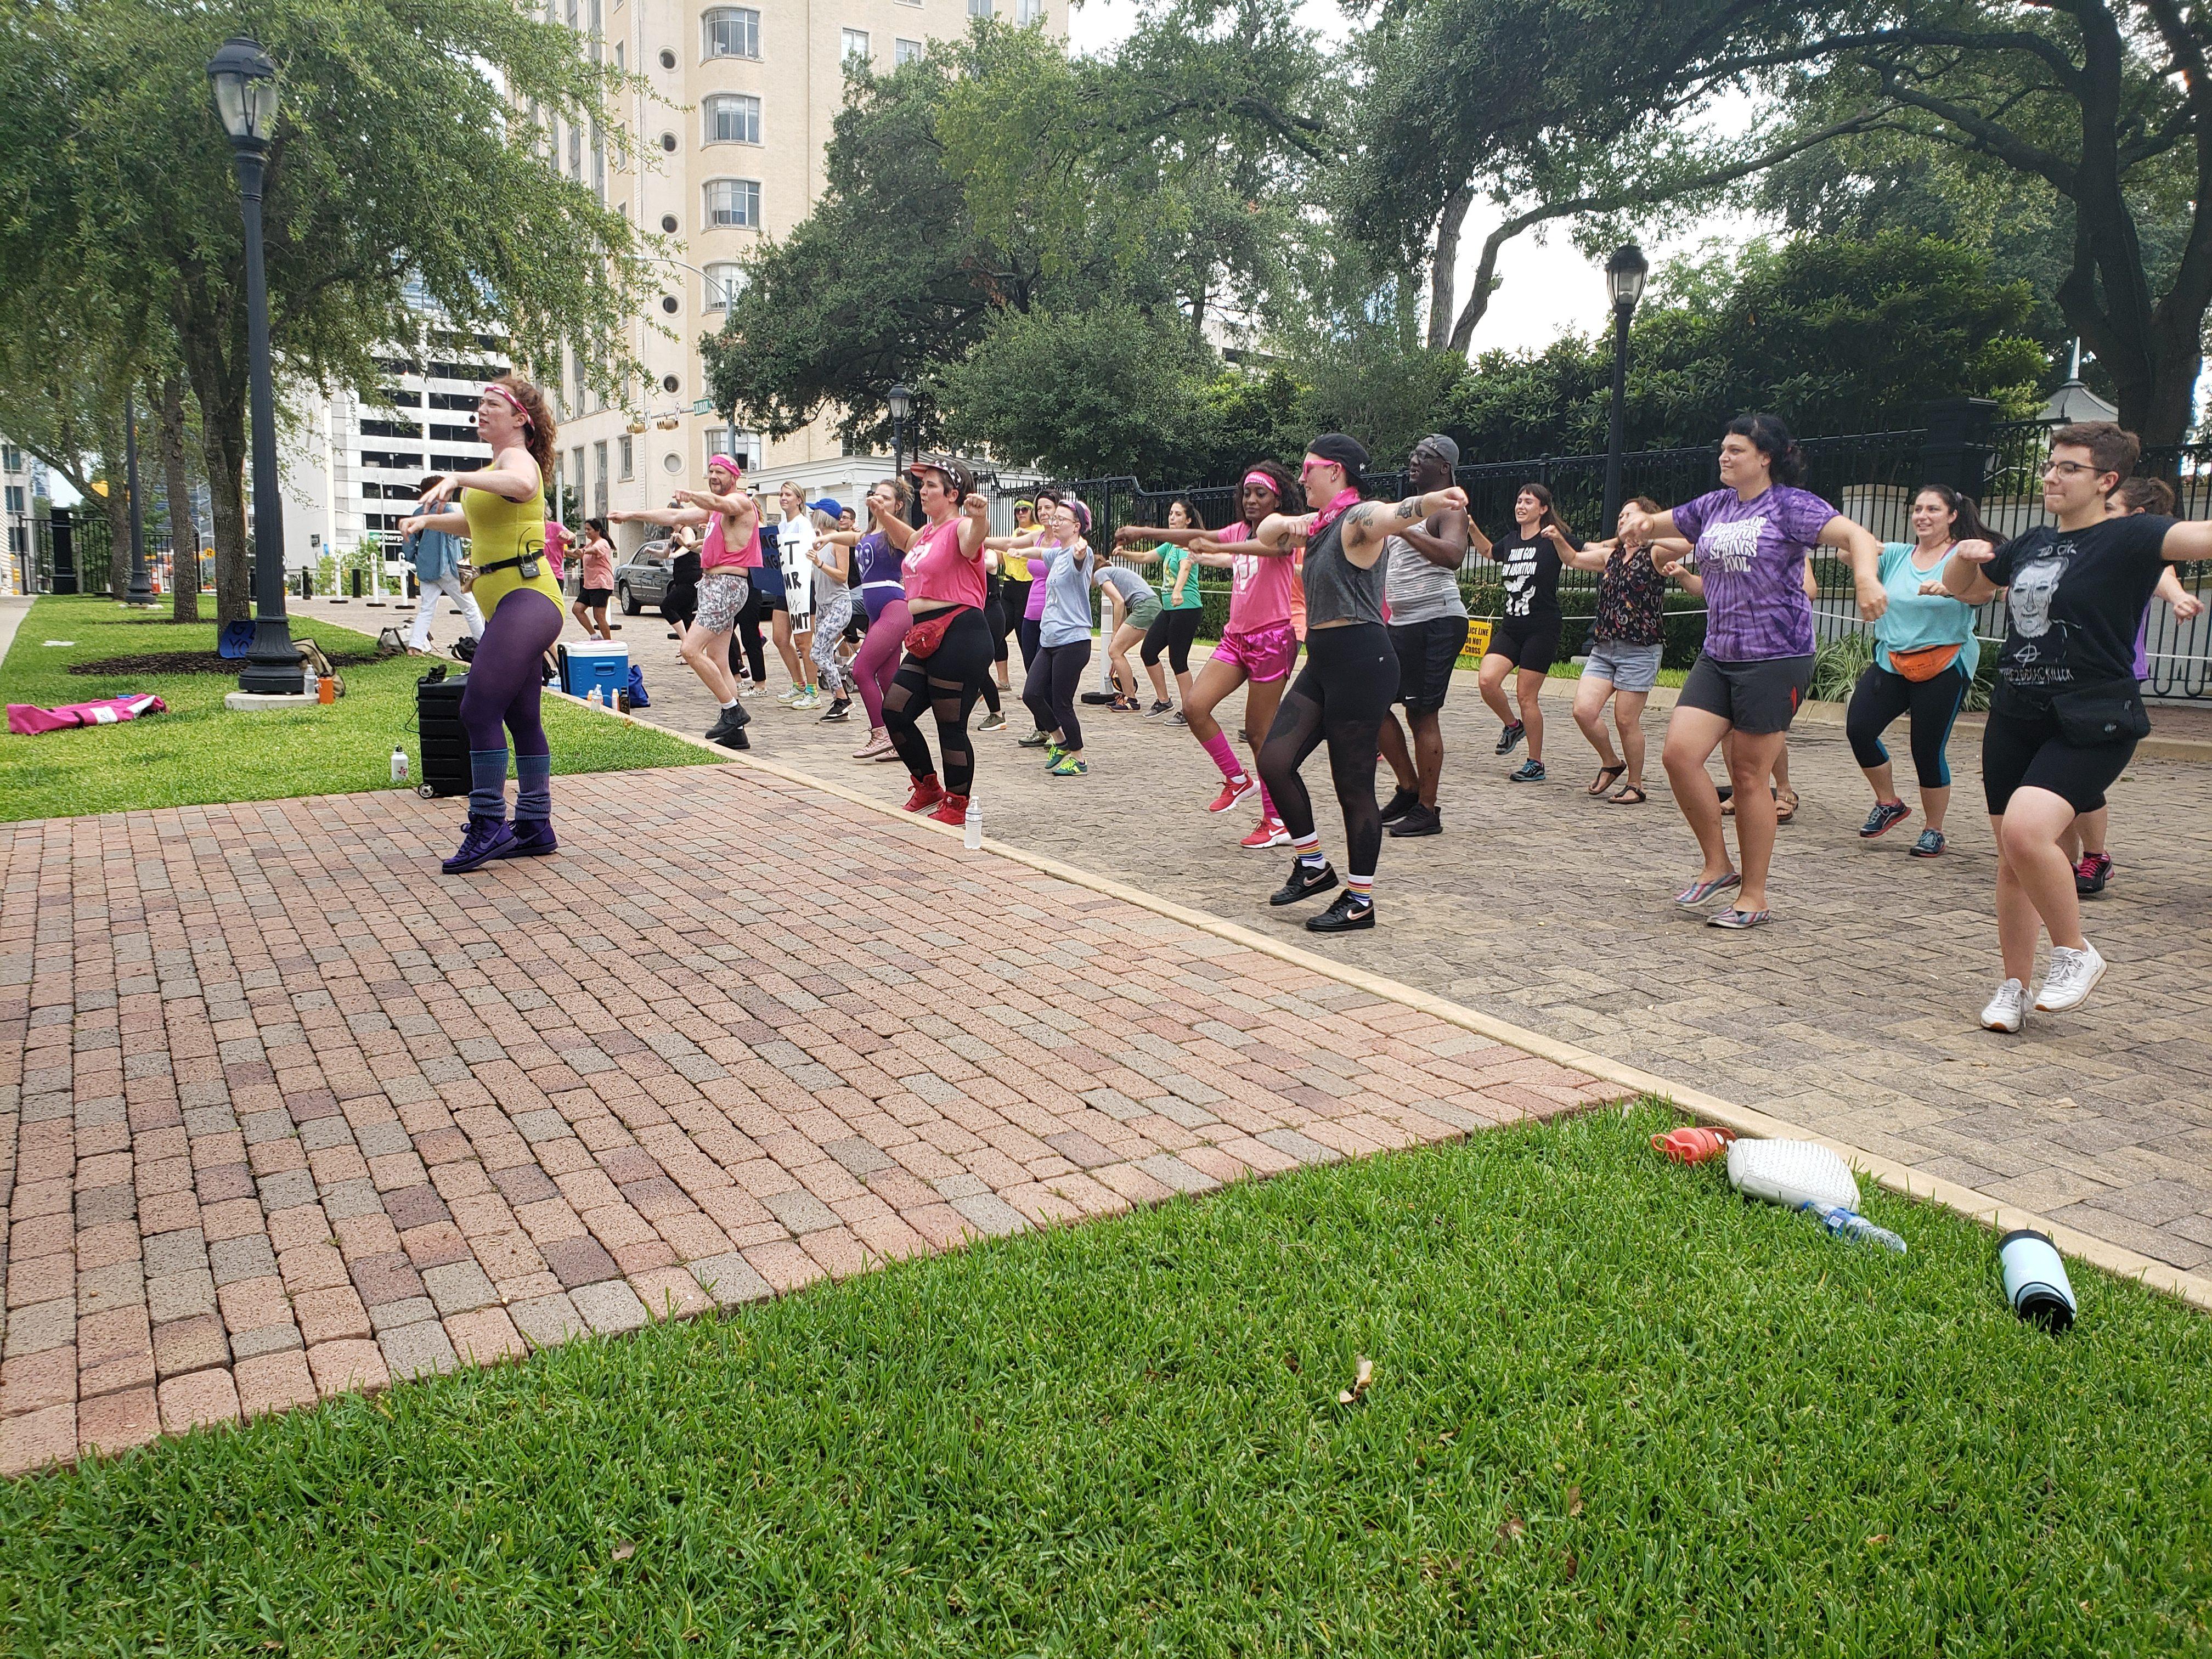 Plannned Parenthood Dance Protest 71519